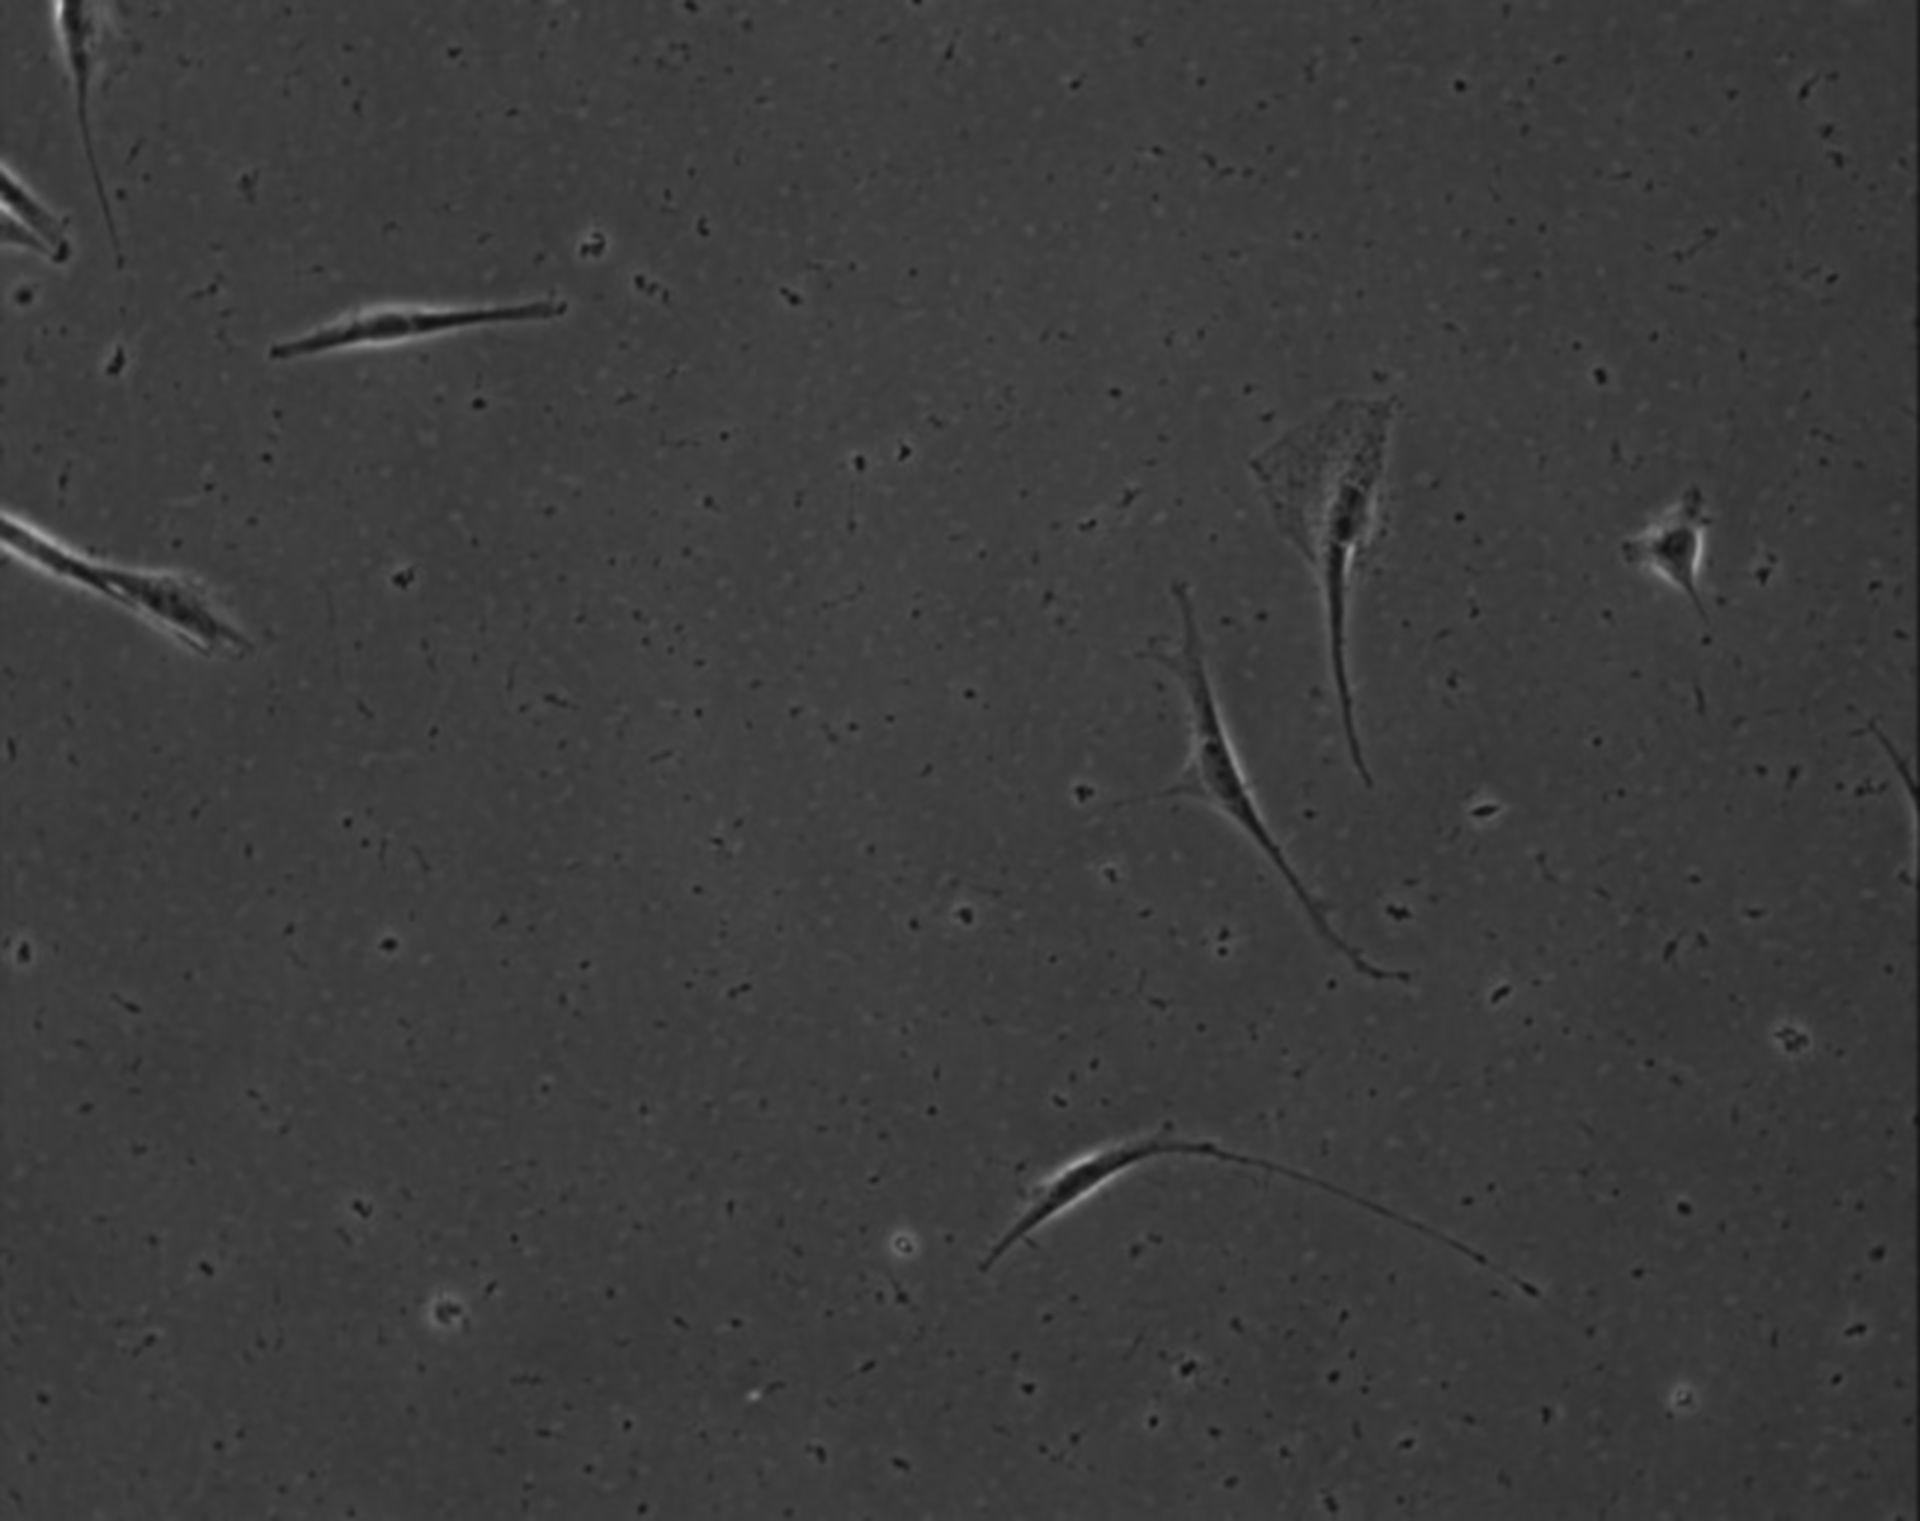 Mus musculus (Extracellular matrix part) - CIL:8904